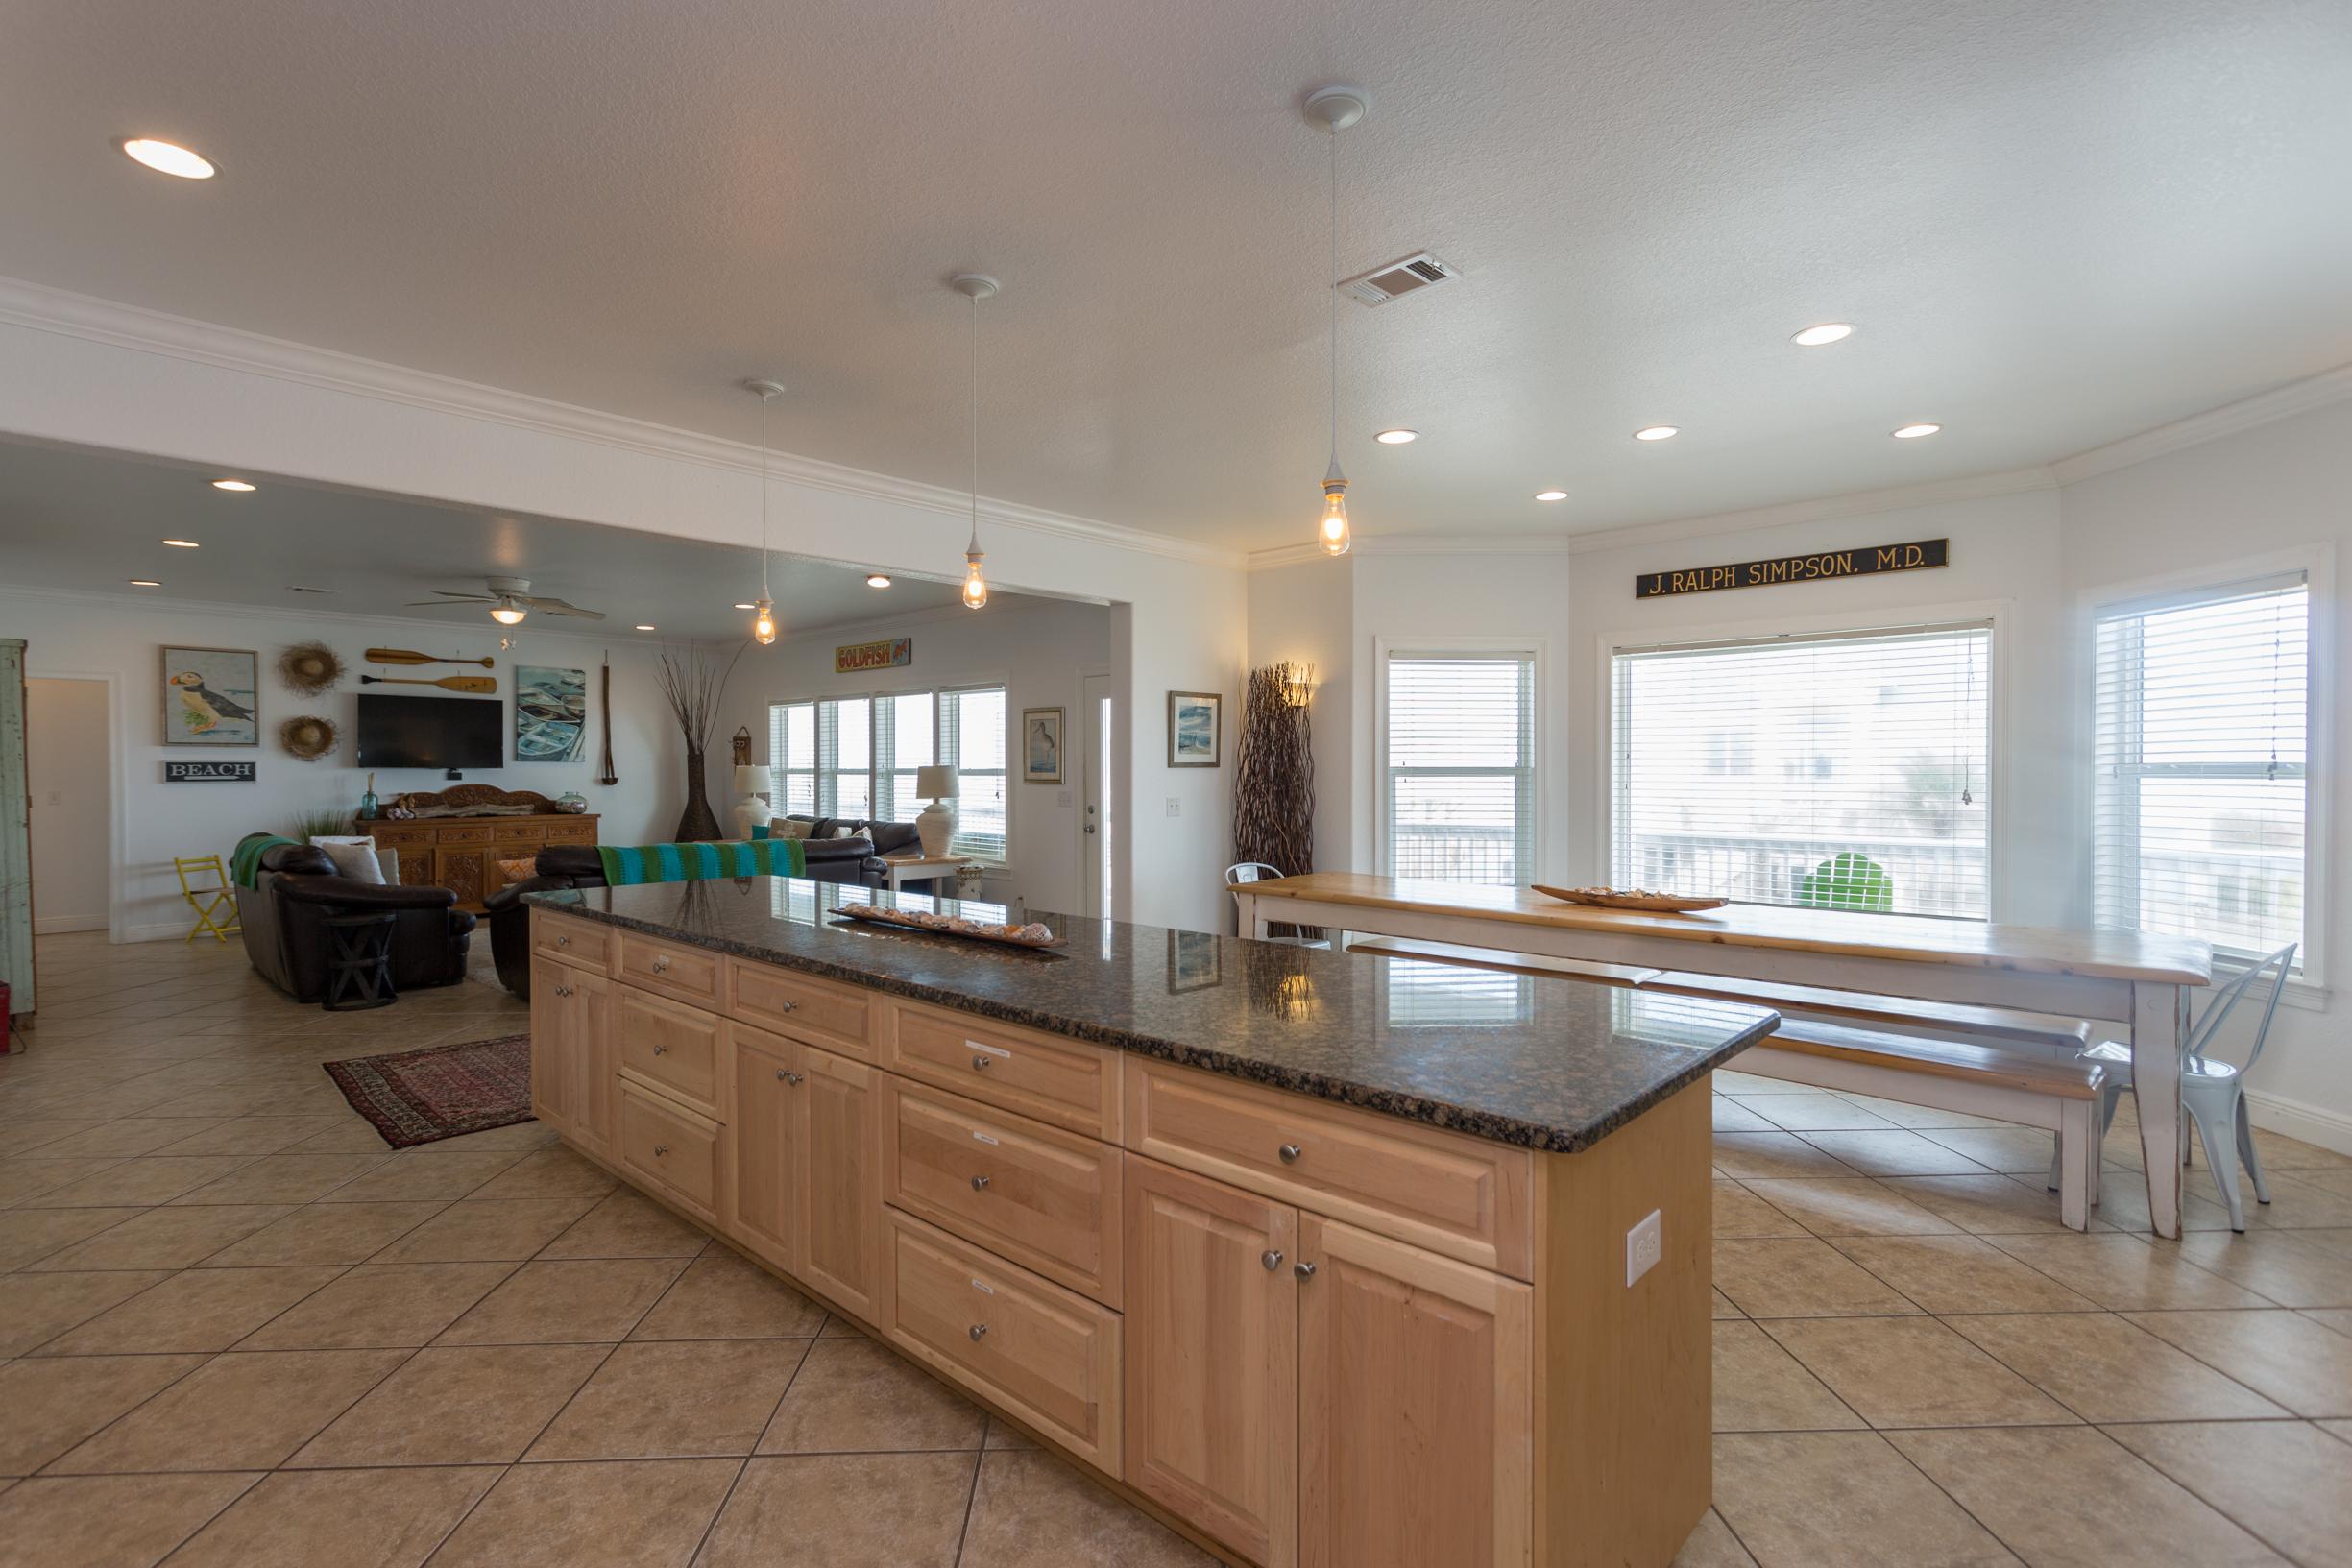 Ariola 1003 - The Starfish House House/Cottage rental in Pensacola Beach House Rentals in Pensacola Beach Florida - #13